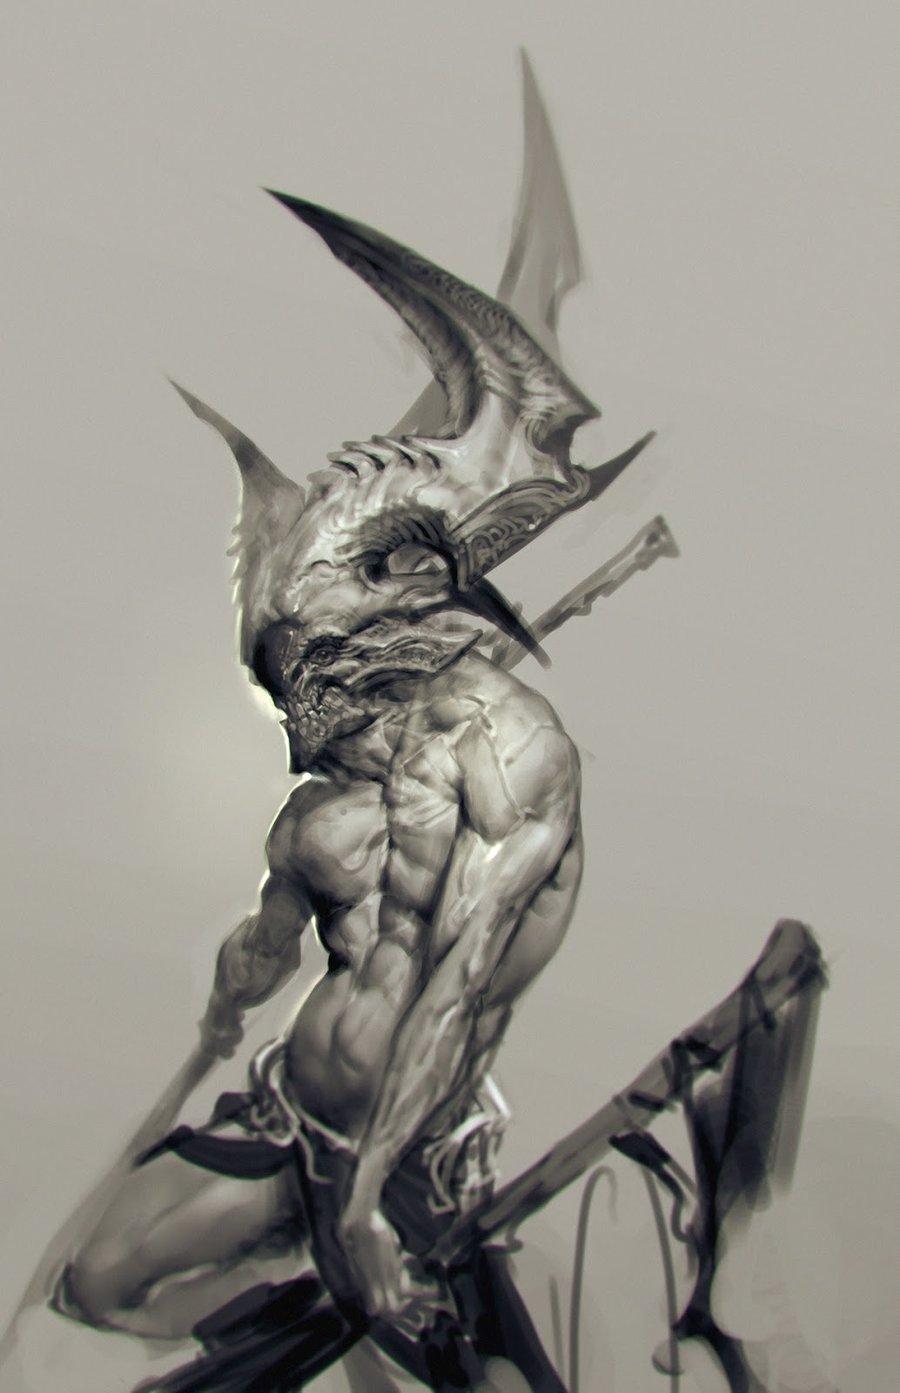 Drawn demon demonic creature On Occult on deviantart demons!